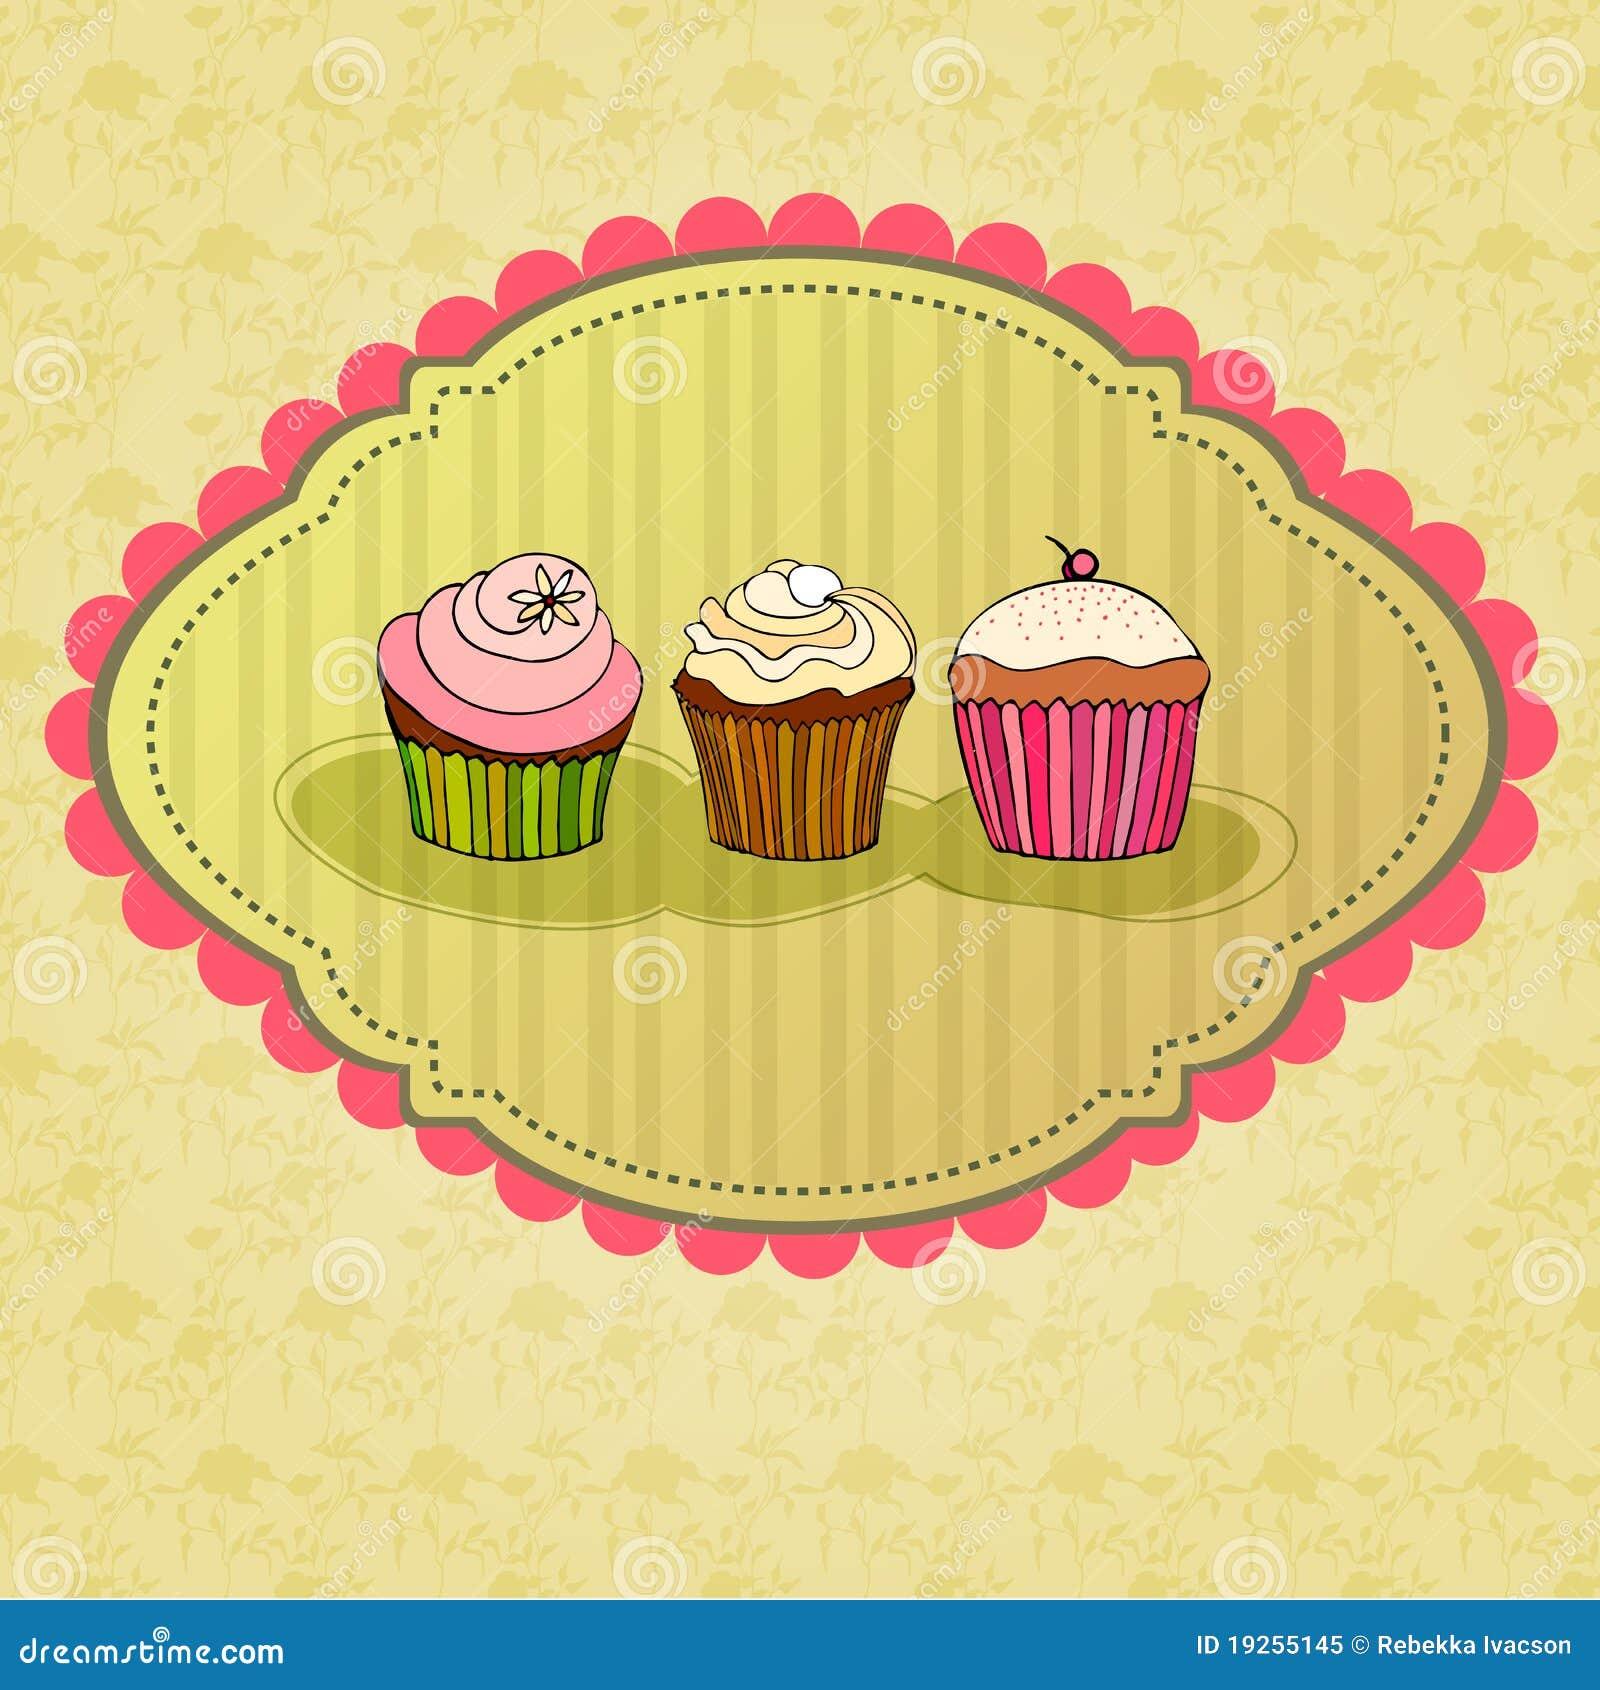 Illustration de rétro carte de gâteau